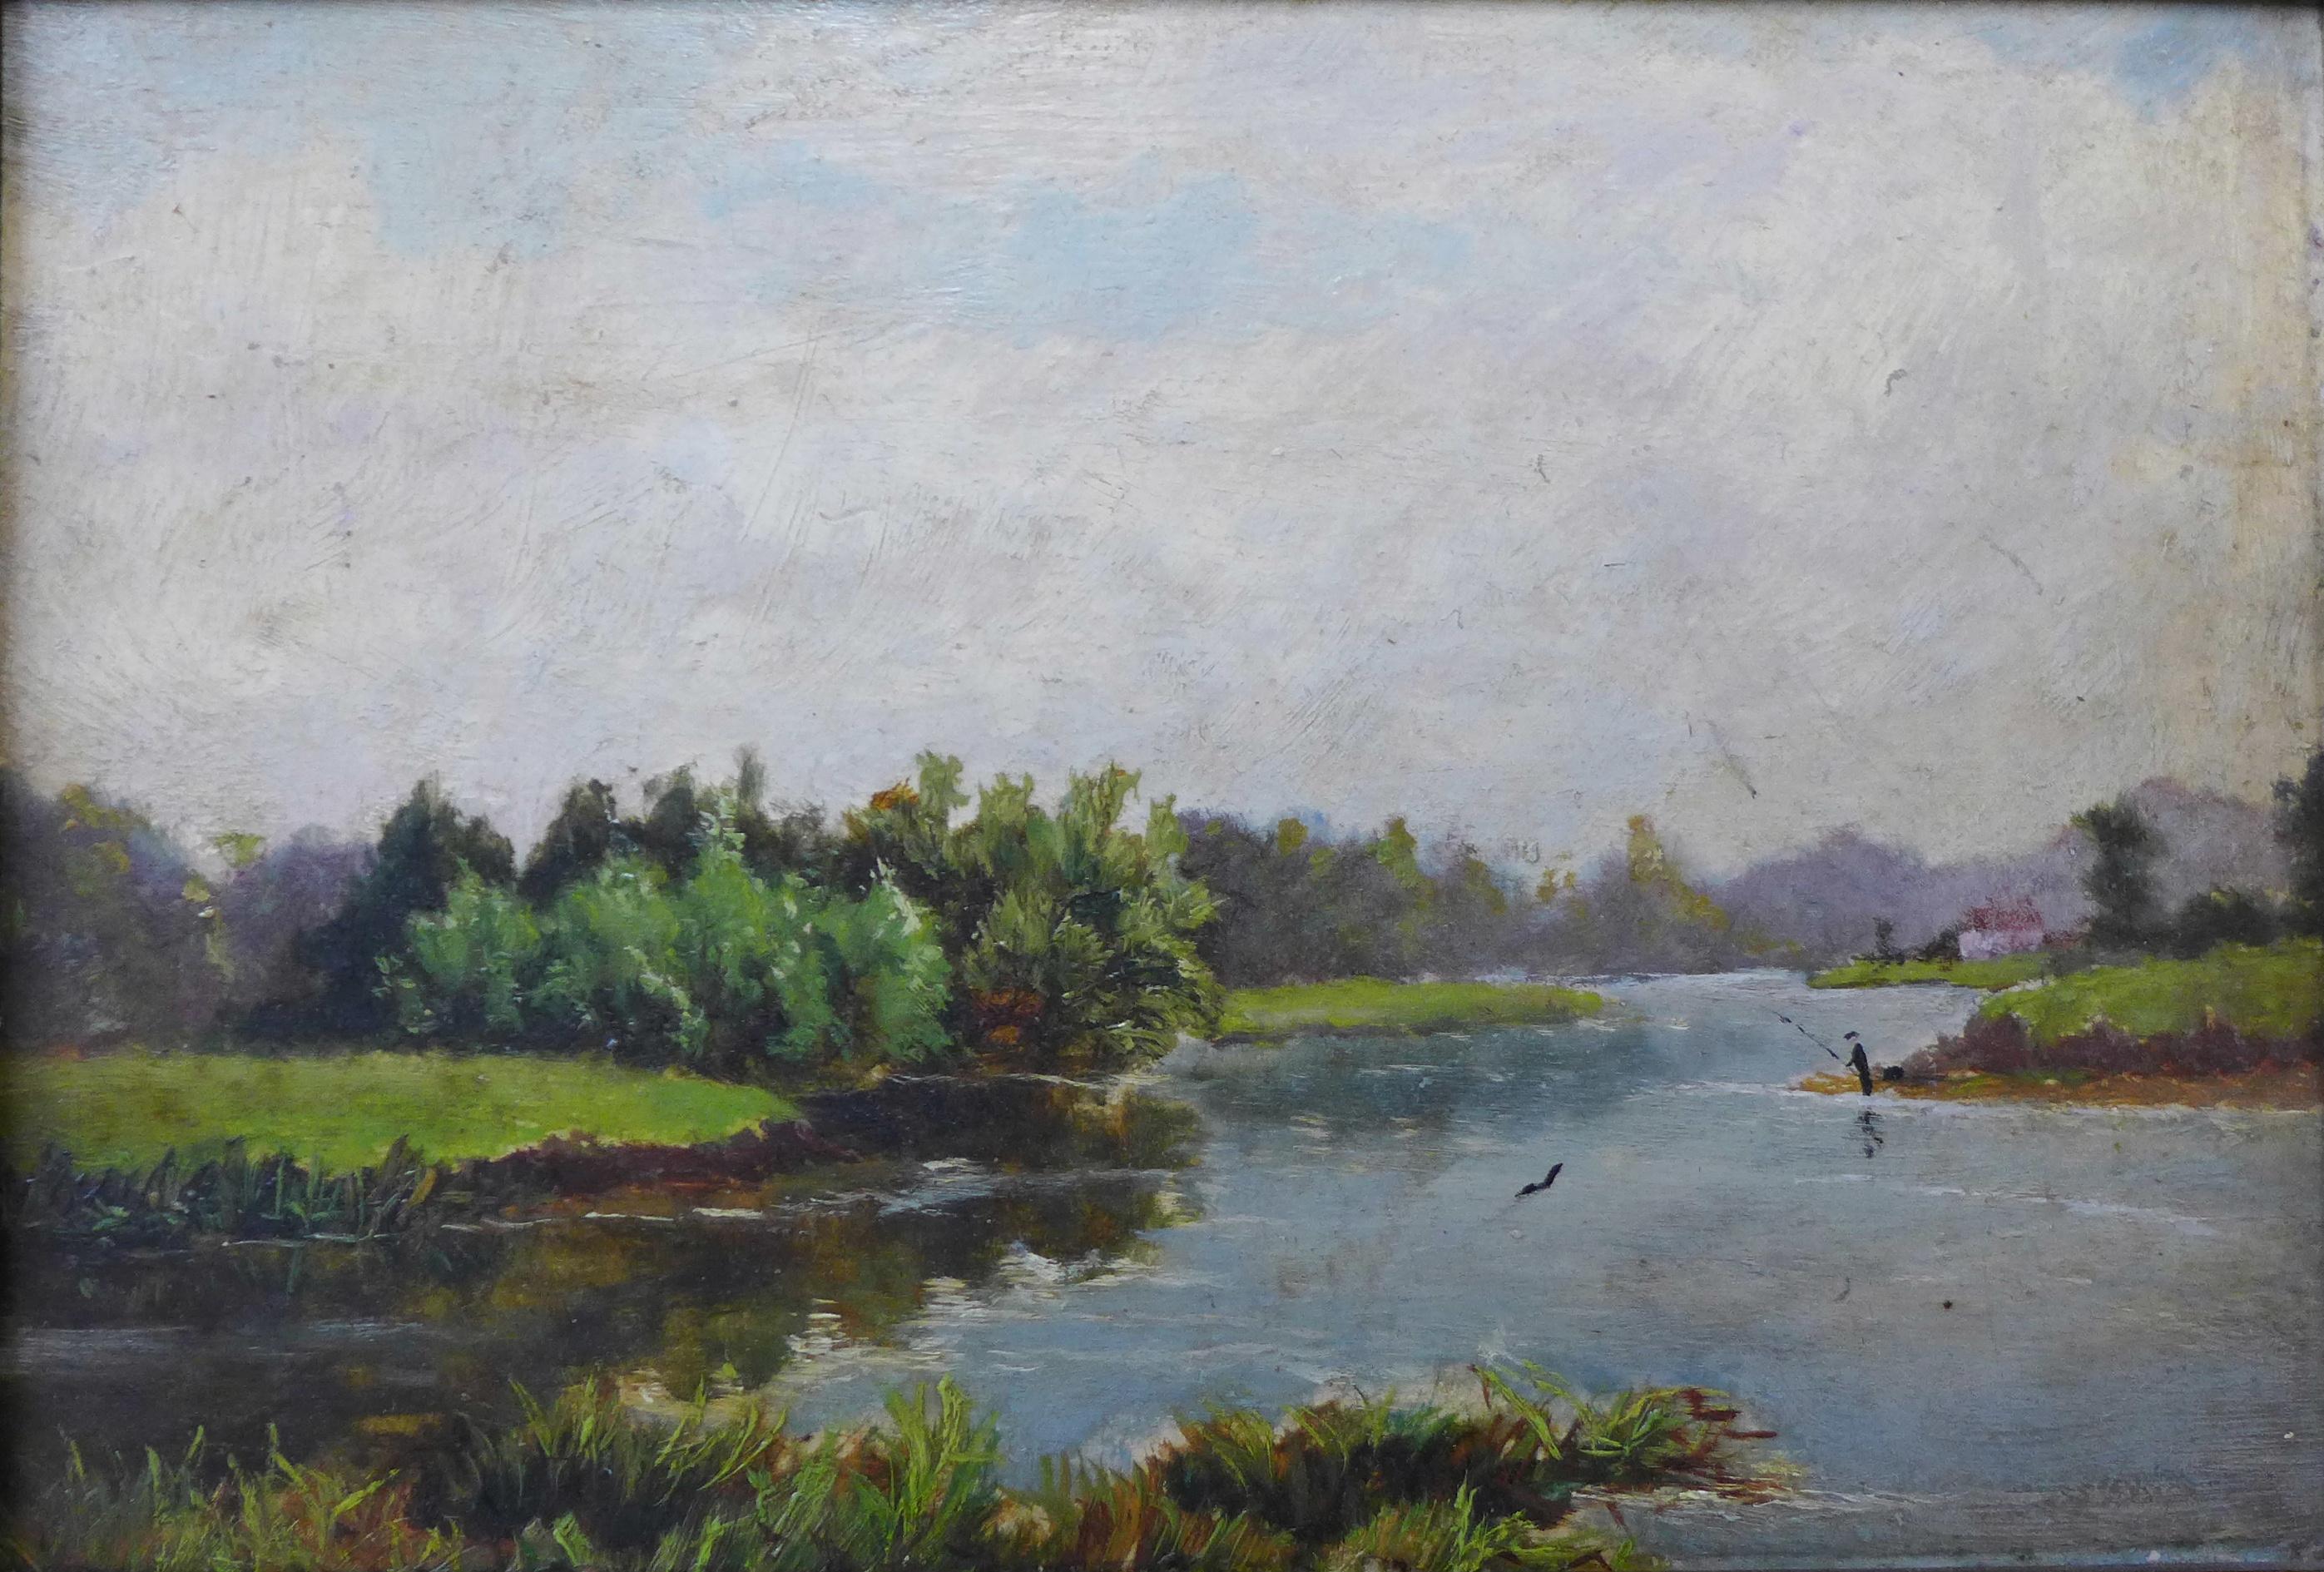 Lot 14 - English School (19th Century), River Trent near Bleasby, Nottinghamshire, oil on board, 16 x 24cms,